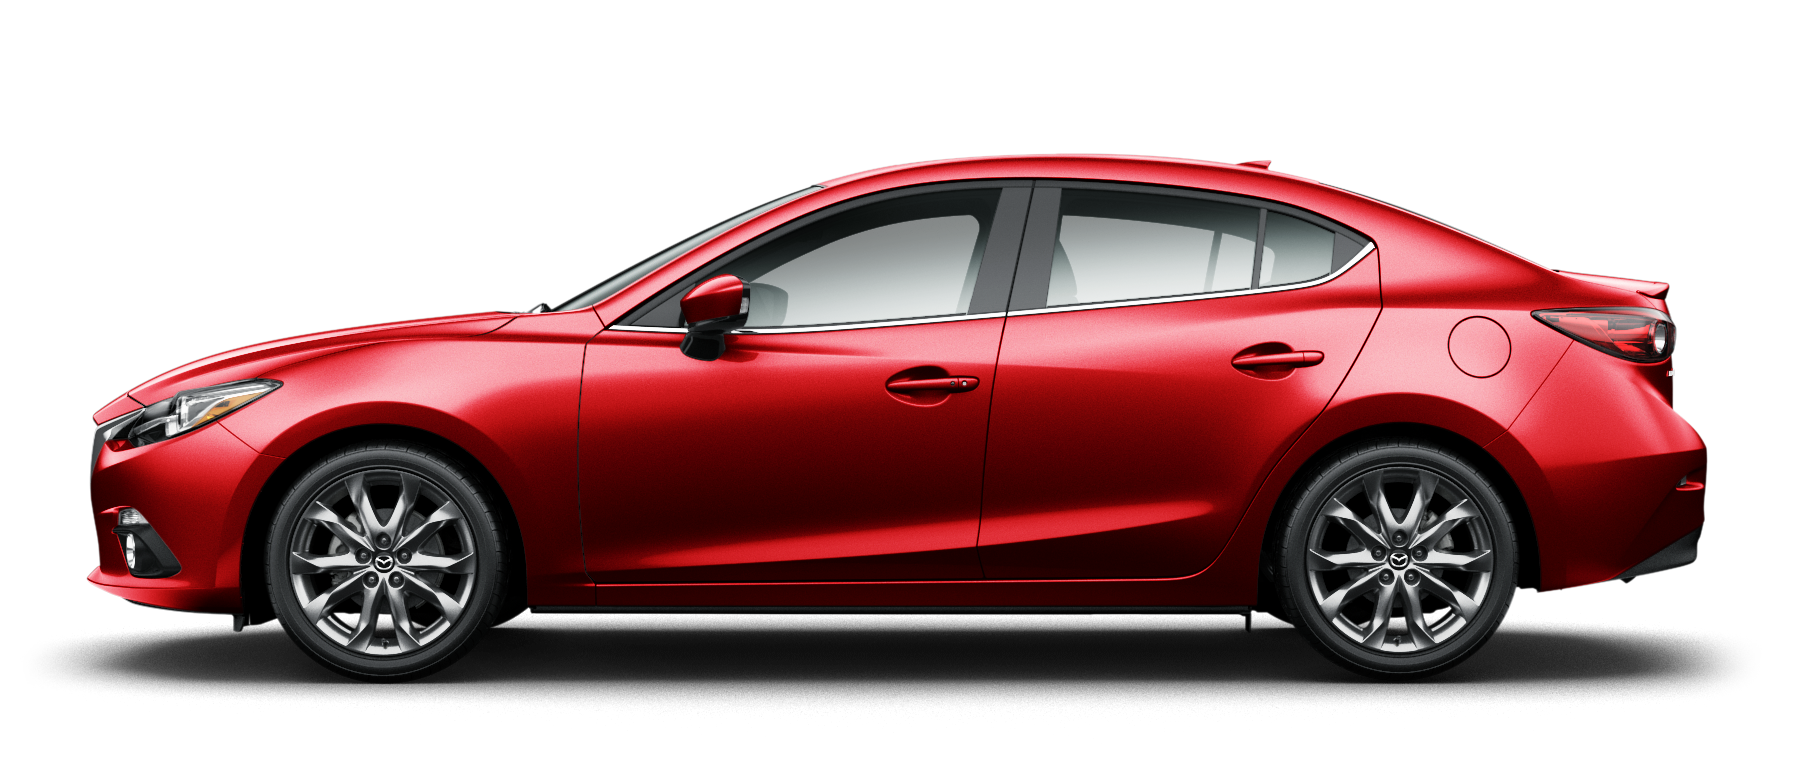 2014 mazda 3 hatchback fuel efficient compact car mazda html autos post. Black Bedroom Furniture Sets. Home Design Ideas